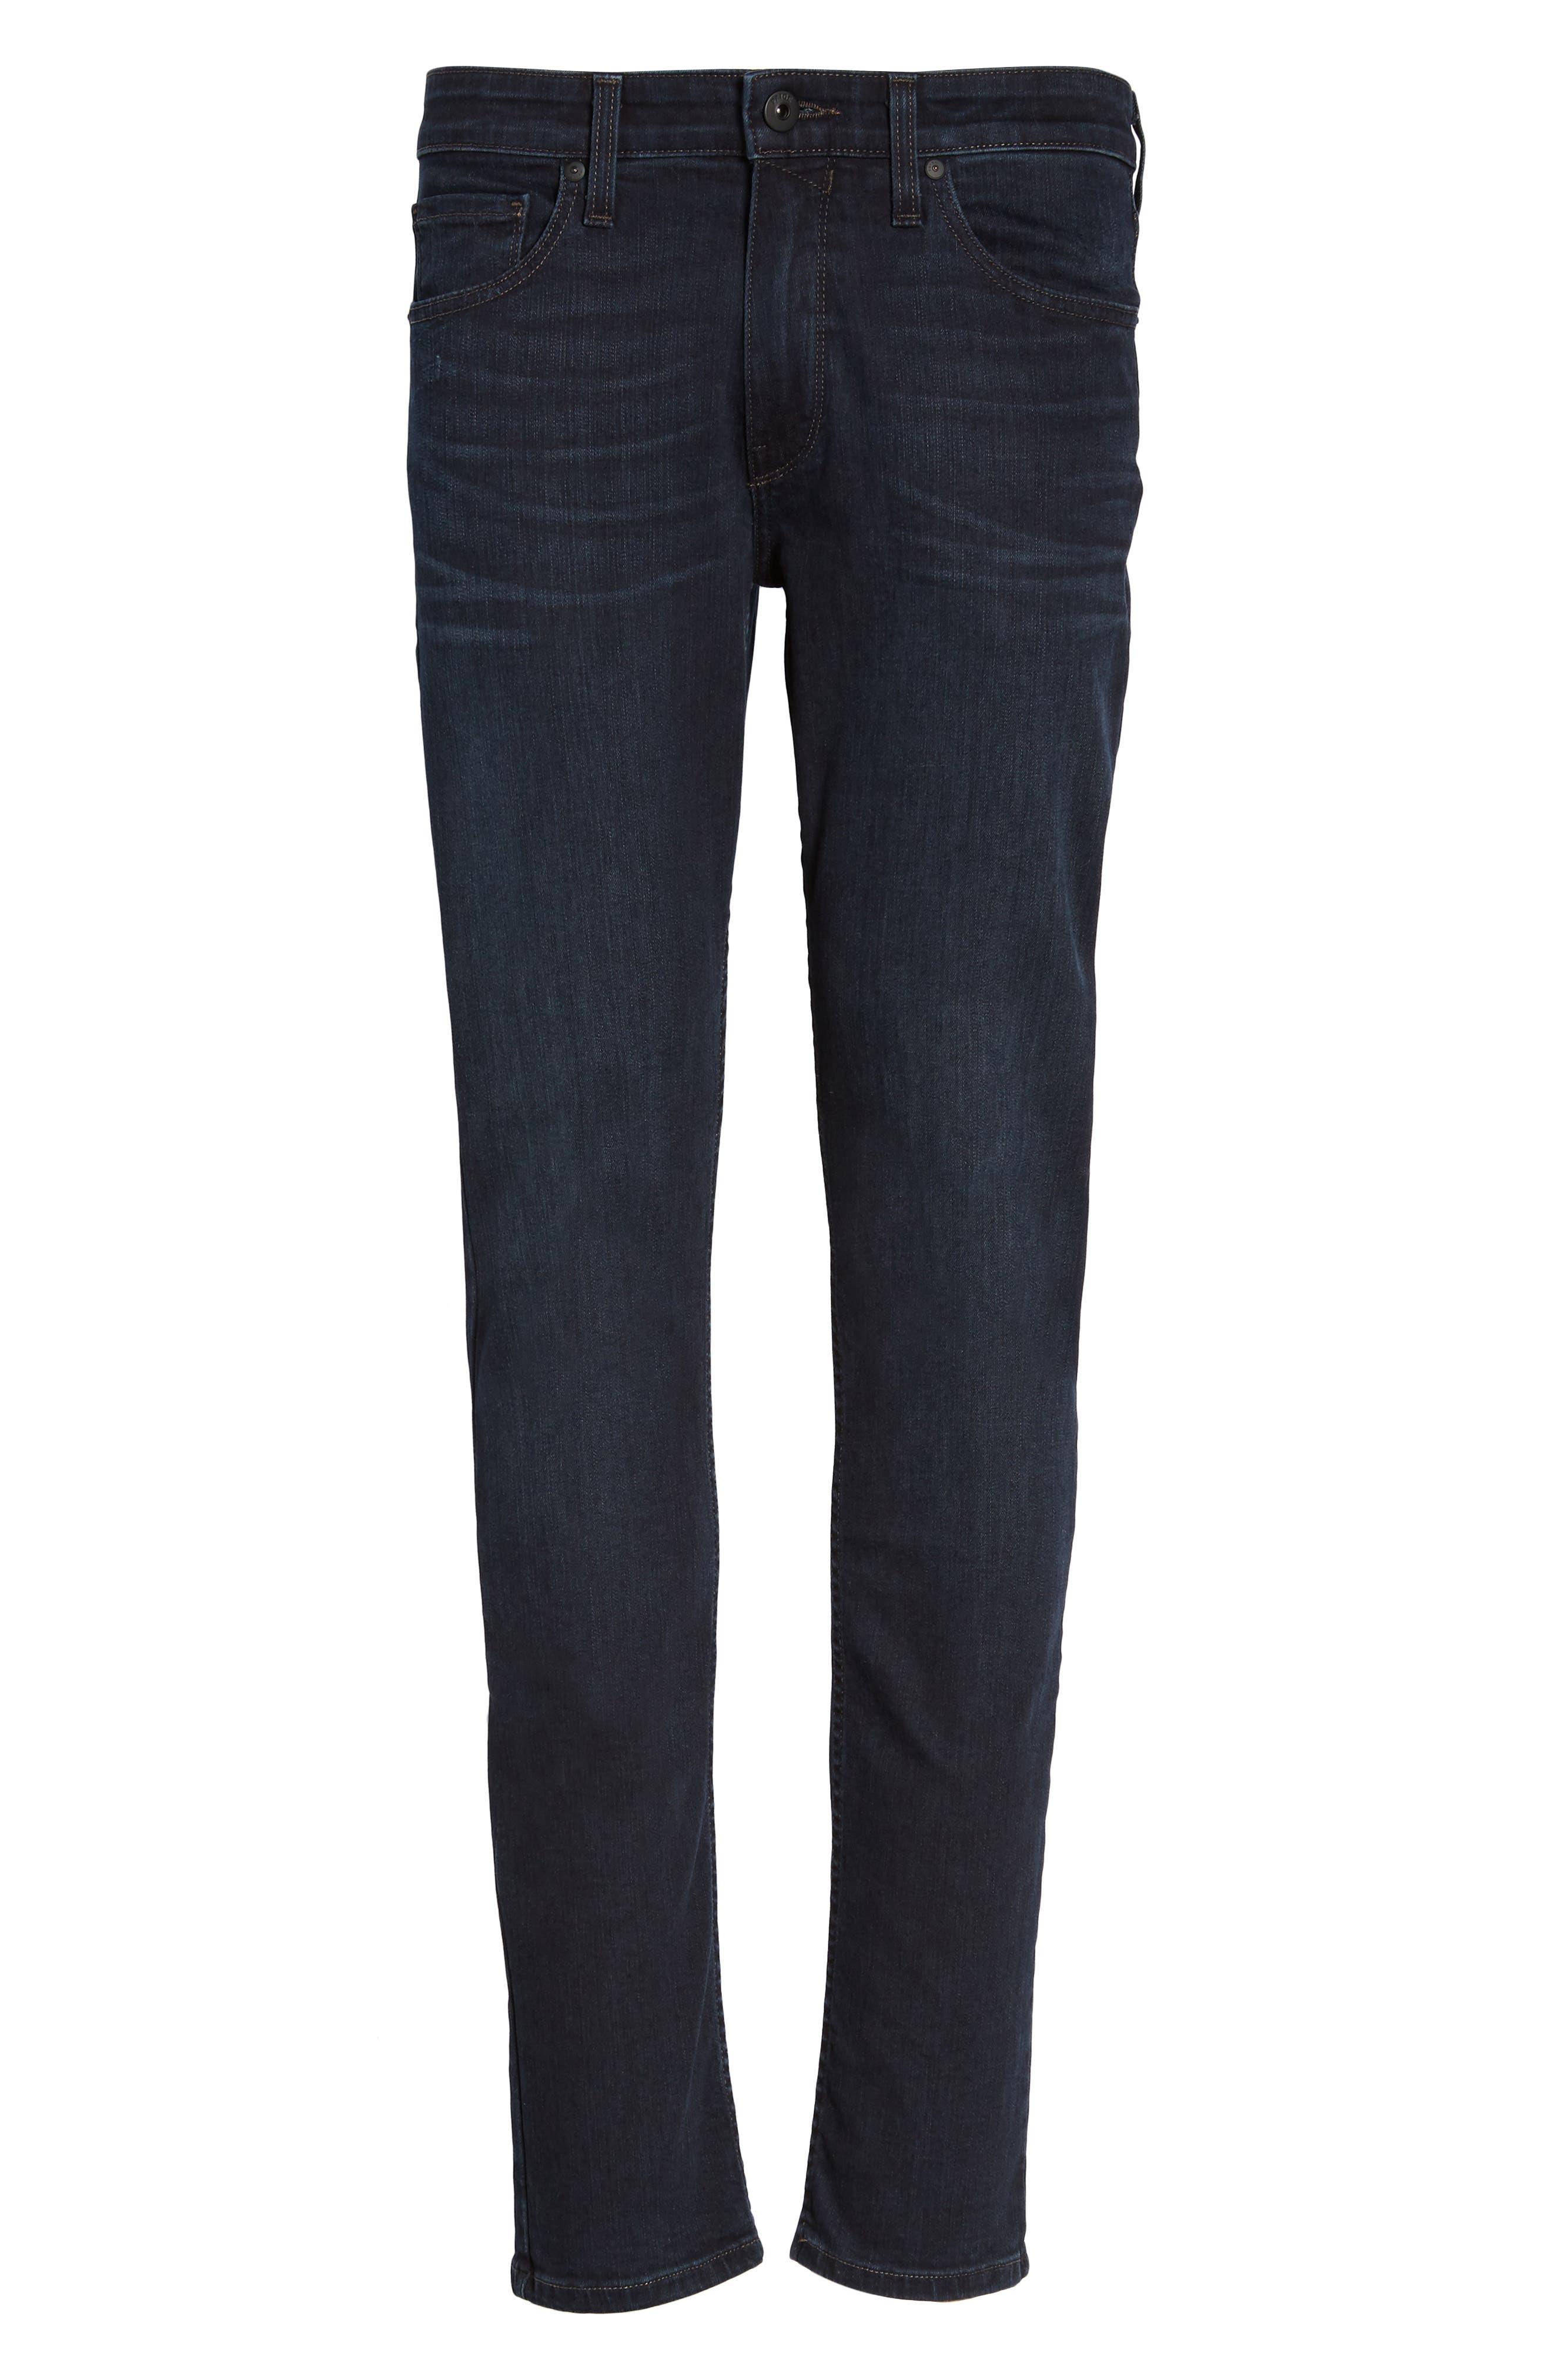 Lennox Slim Fit Jeans,                             Alternate thumbnail 6, color,